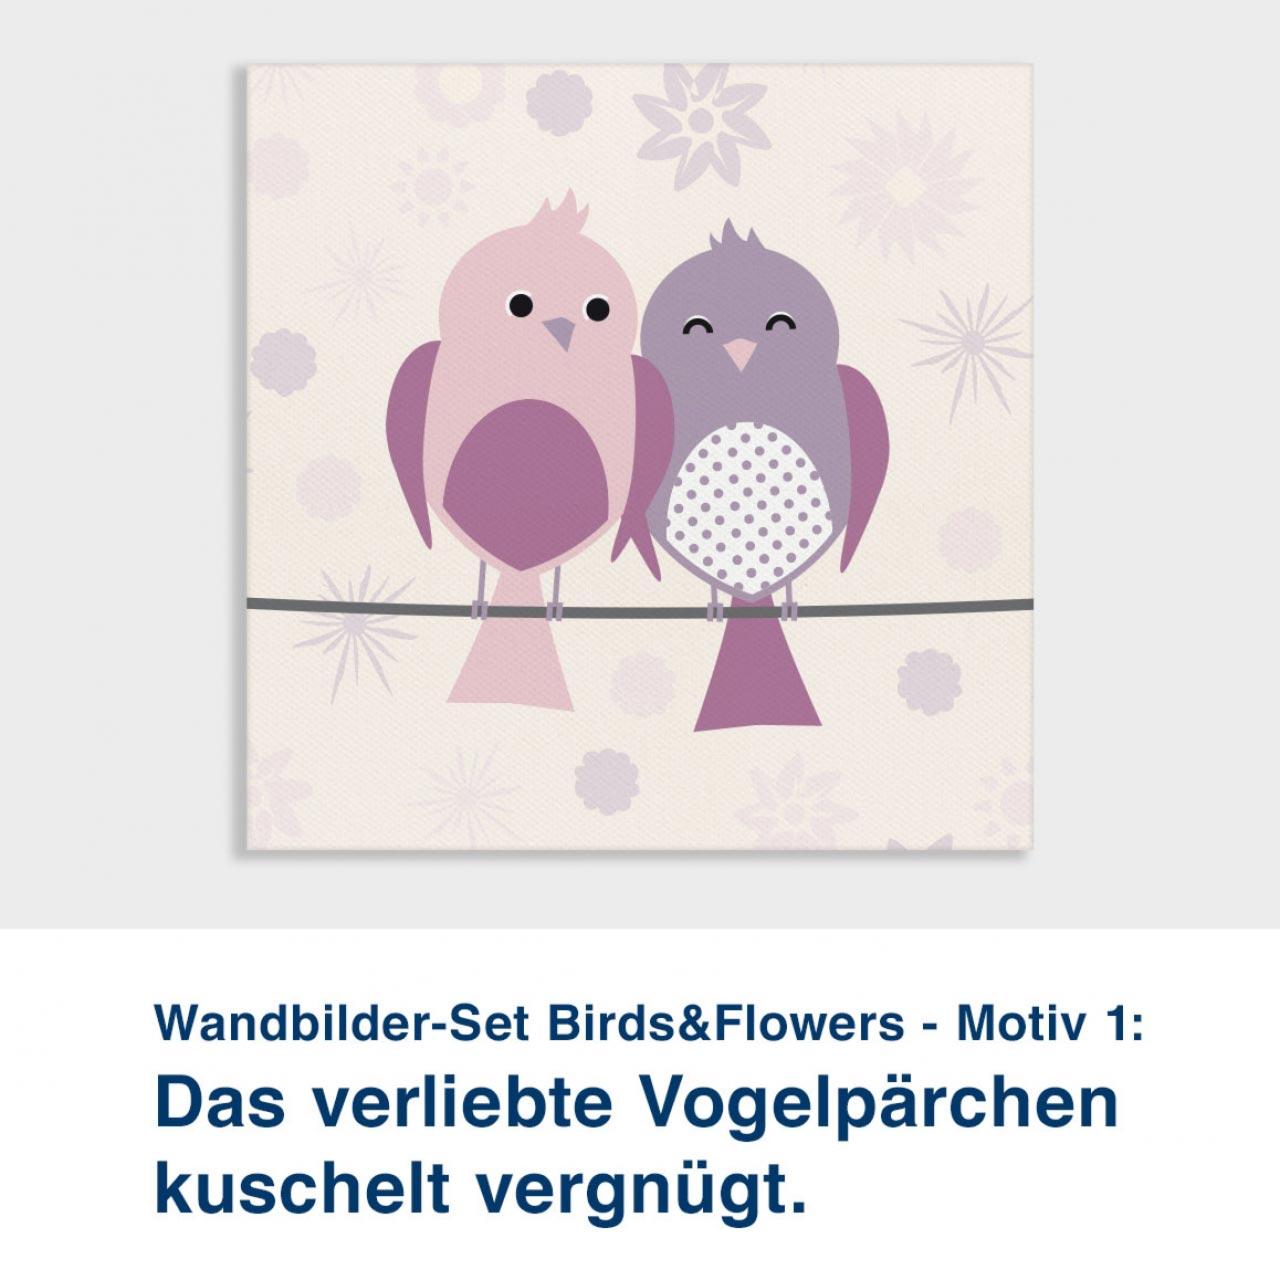 Wandbilder-Set Birds&Flowers - Motiv 1:  Das verliebte Vogelpärchen  kuschelt vergnügt.